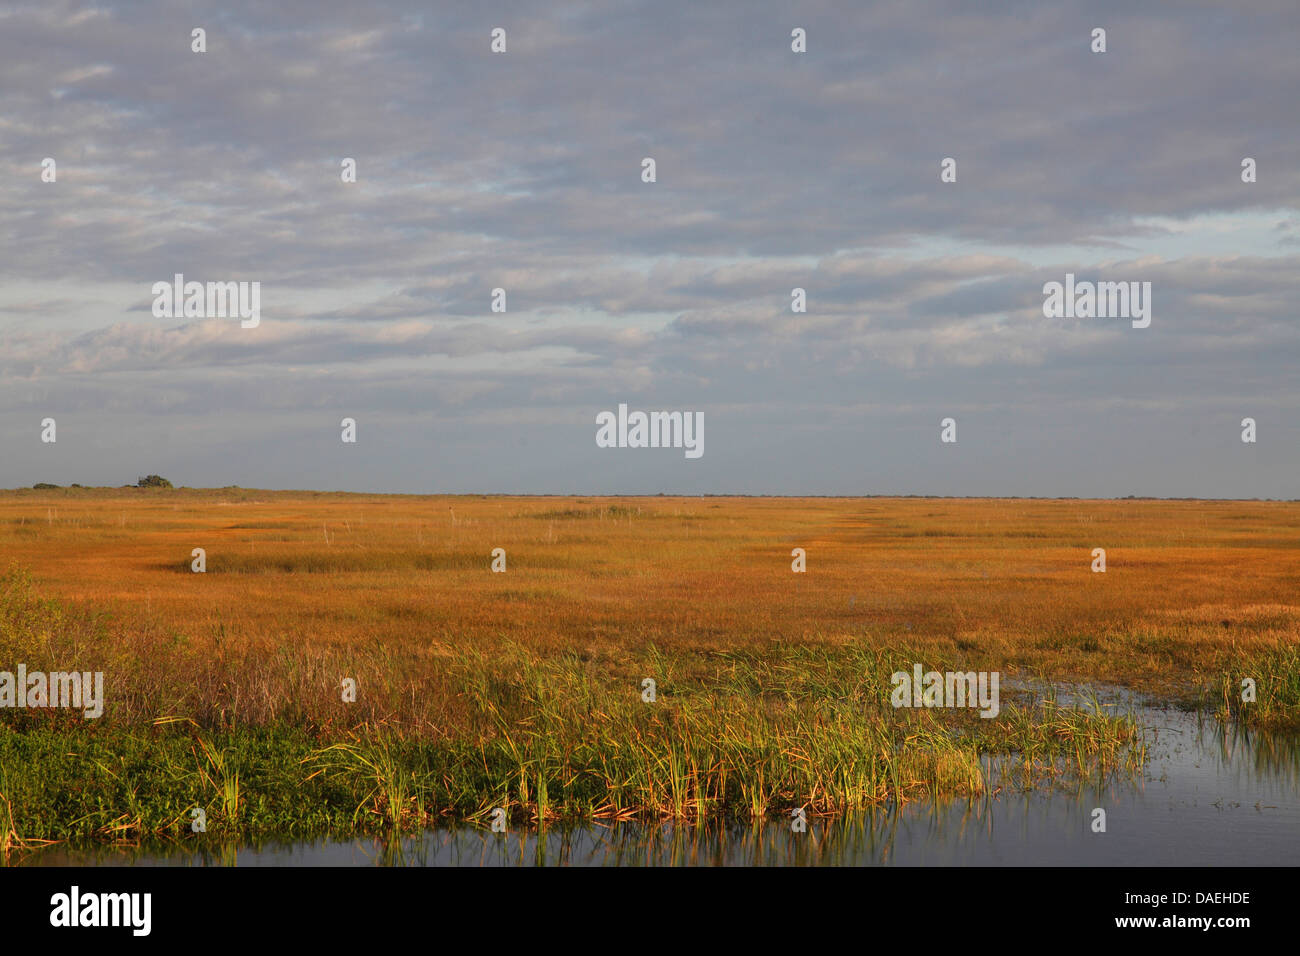 sawgrass-prairie, USA, Florida, Everglades National Park - Stock Image